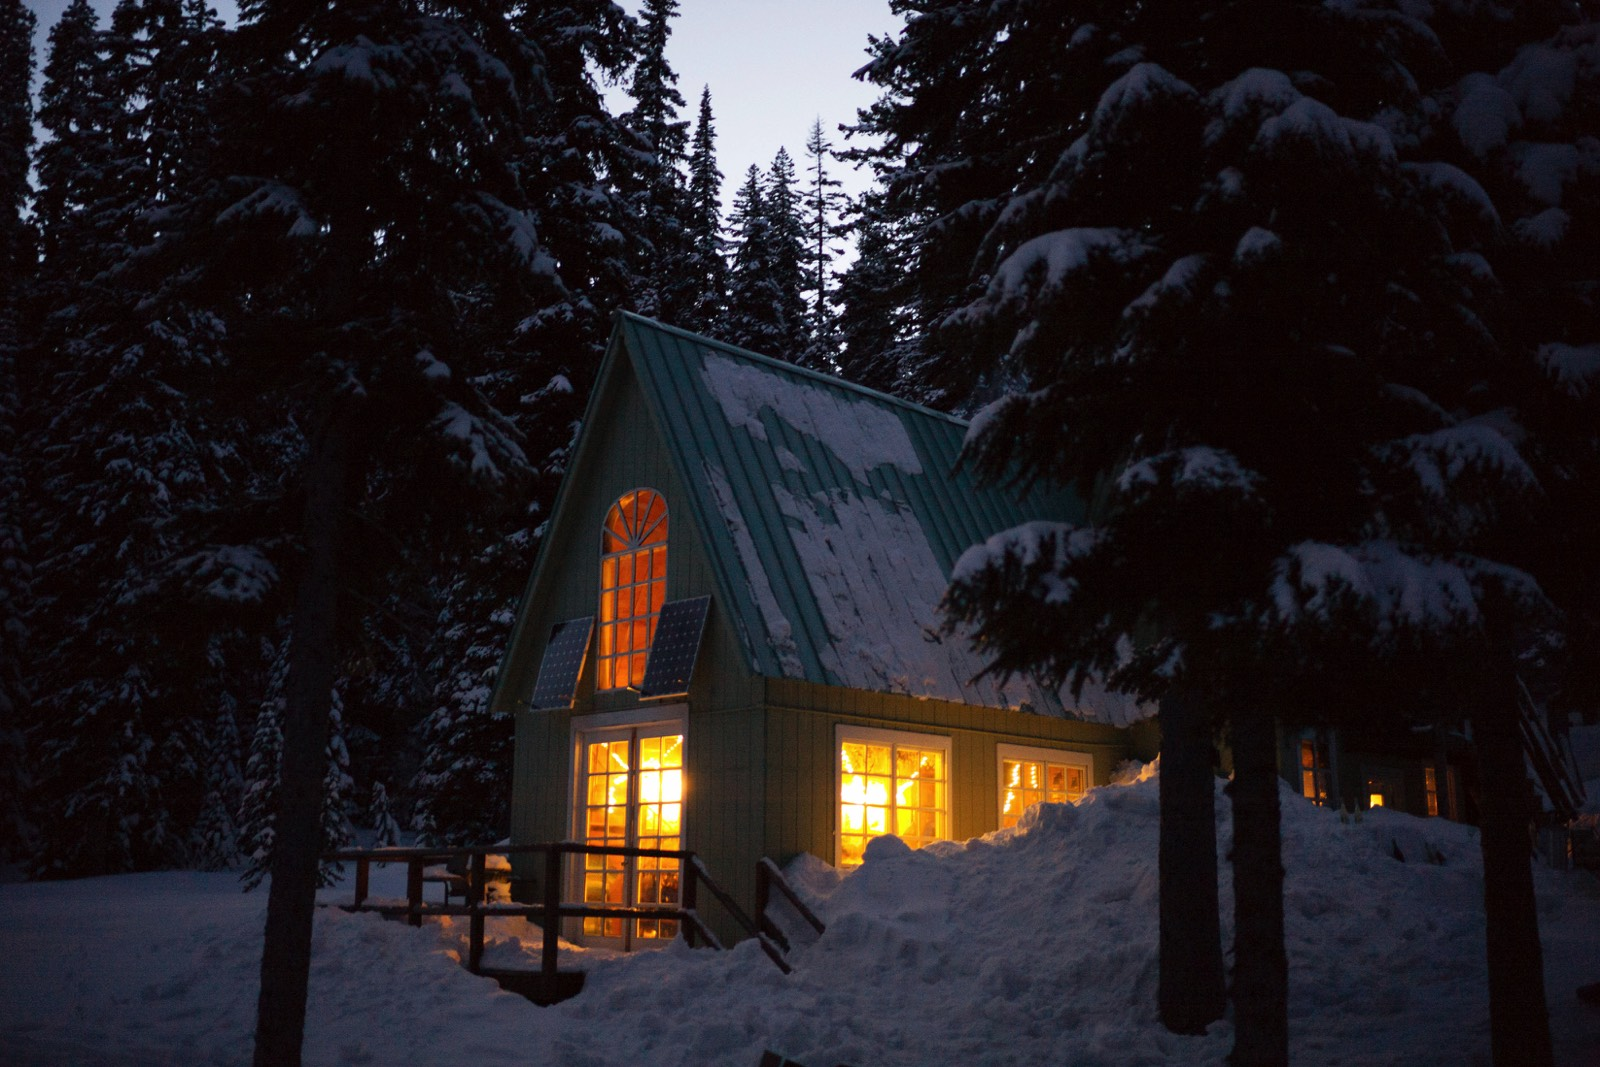 alpine-lakes-high-camp-winter-wedding-89 ALPINE LAKES HIGH CAMP WEDDING